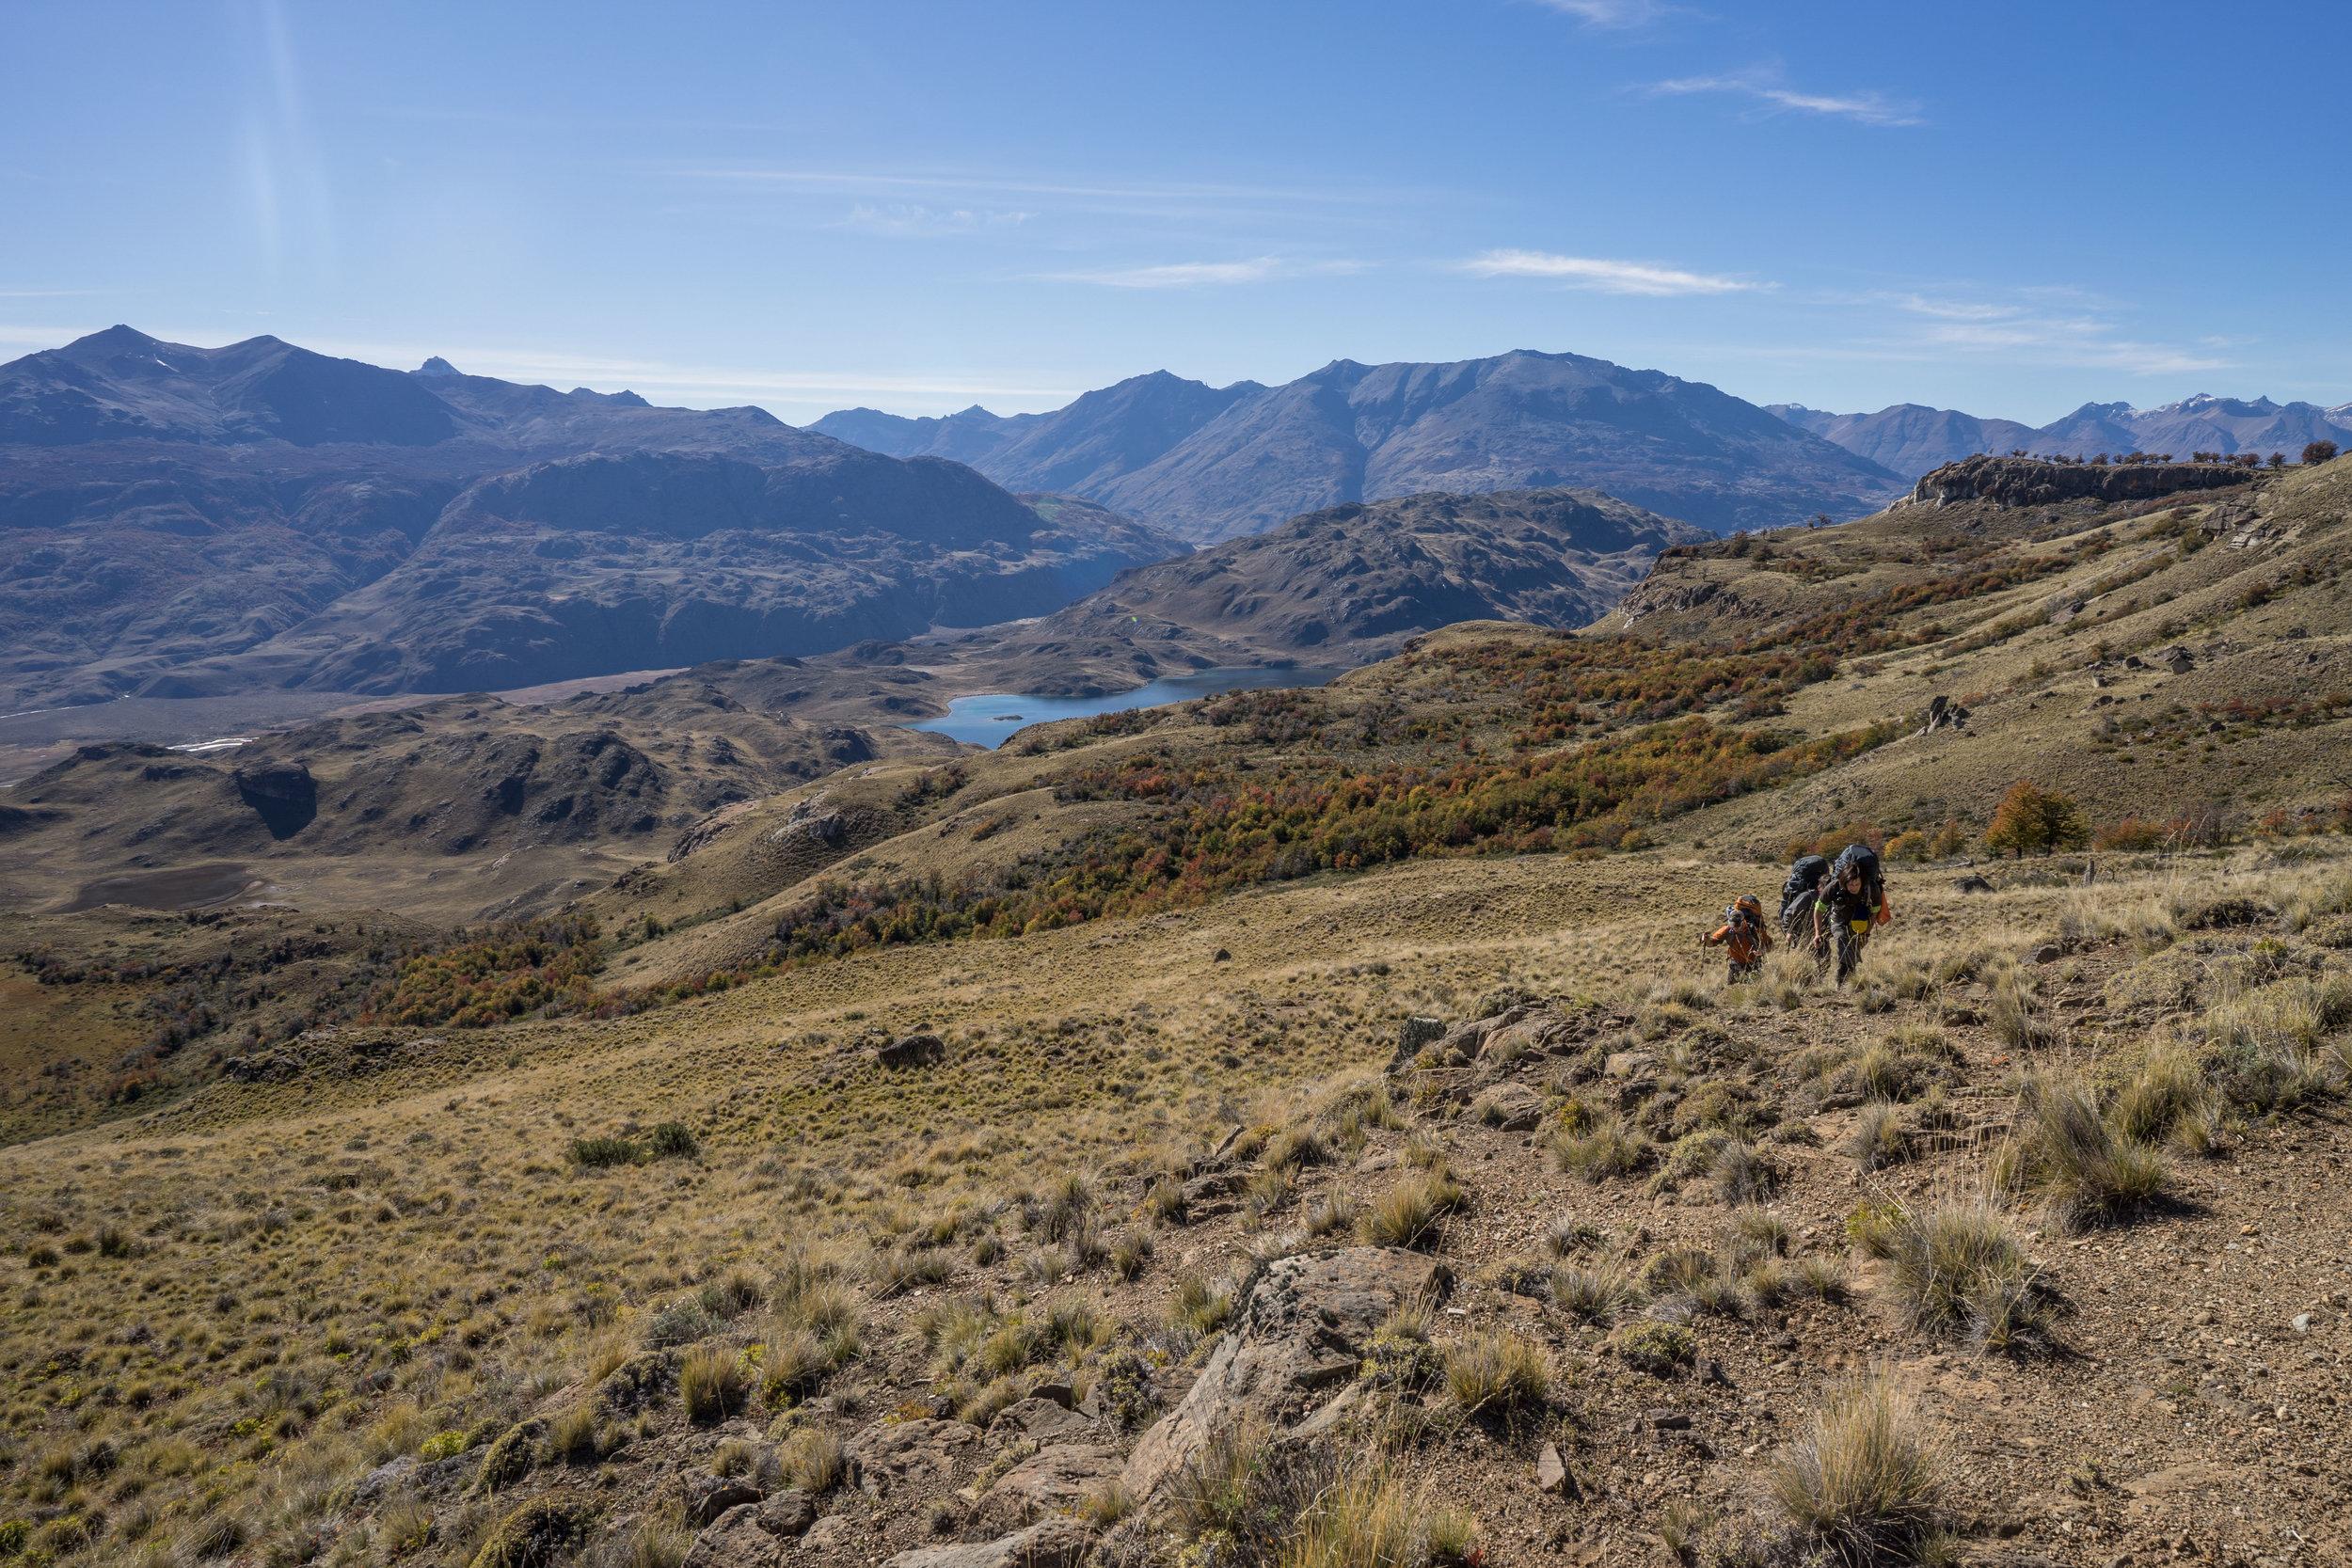 Hiking into Patagonia Park from Siete Lagunas